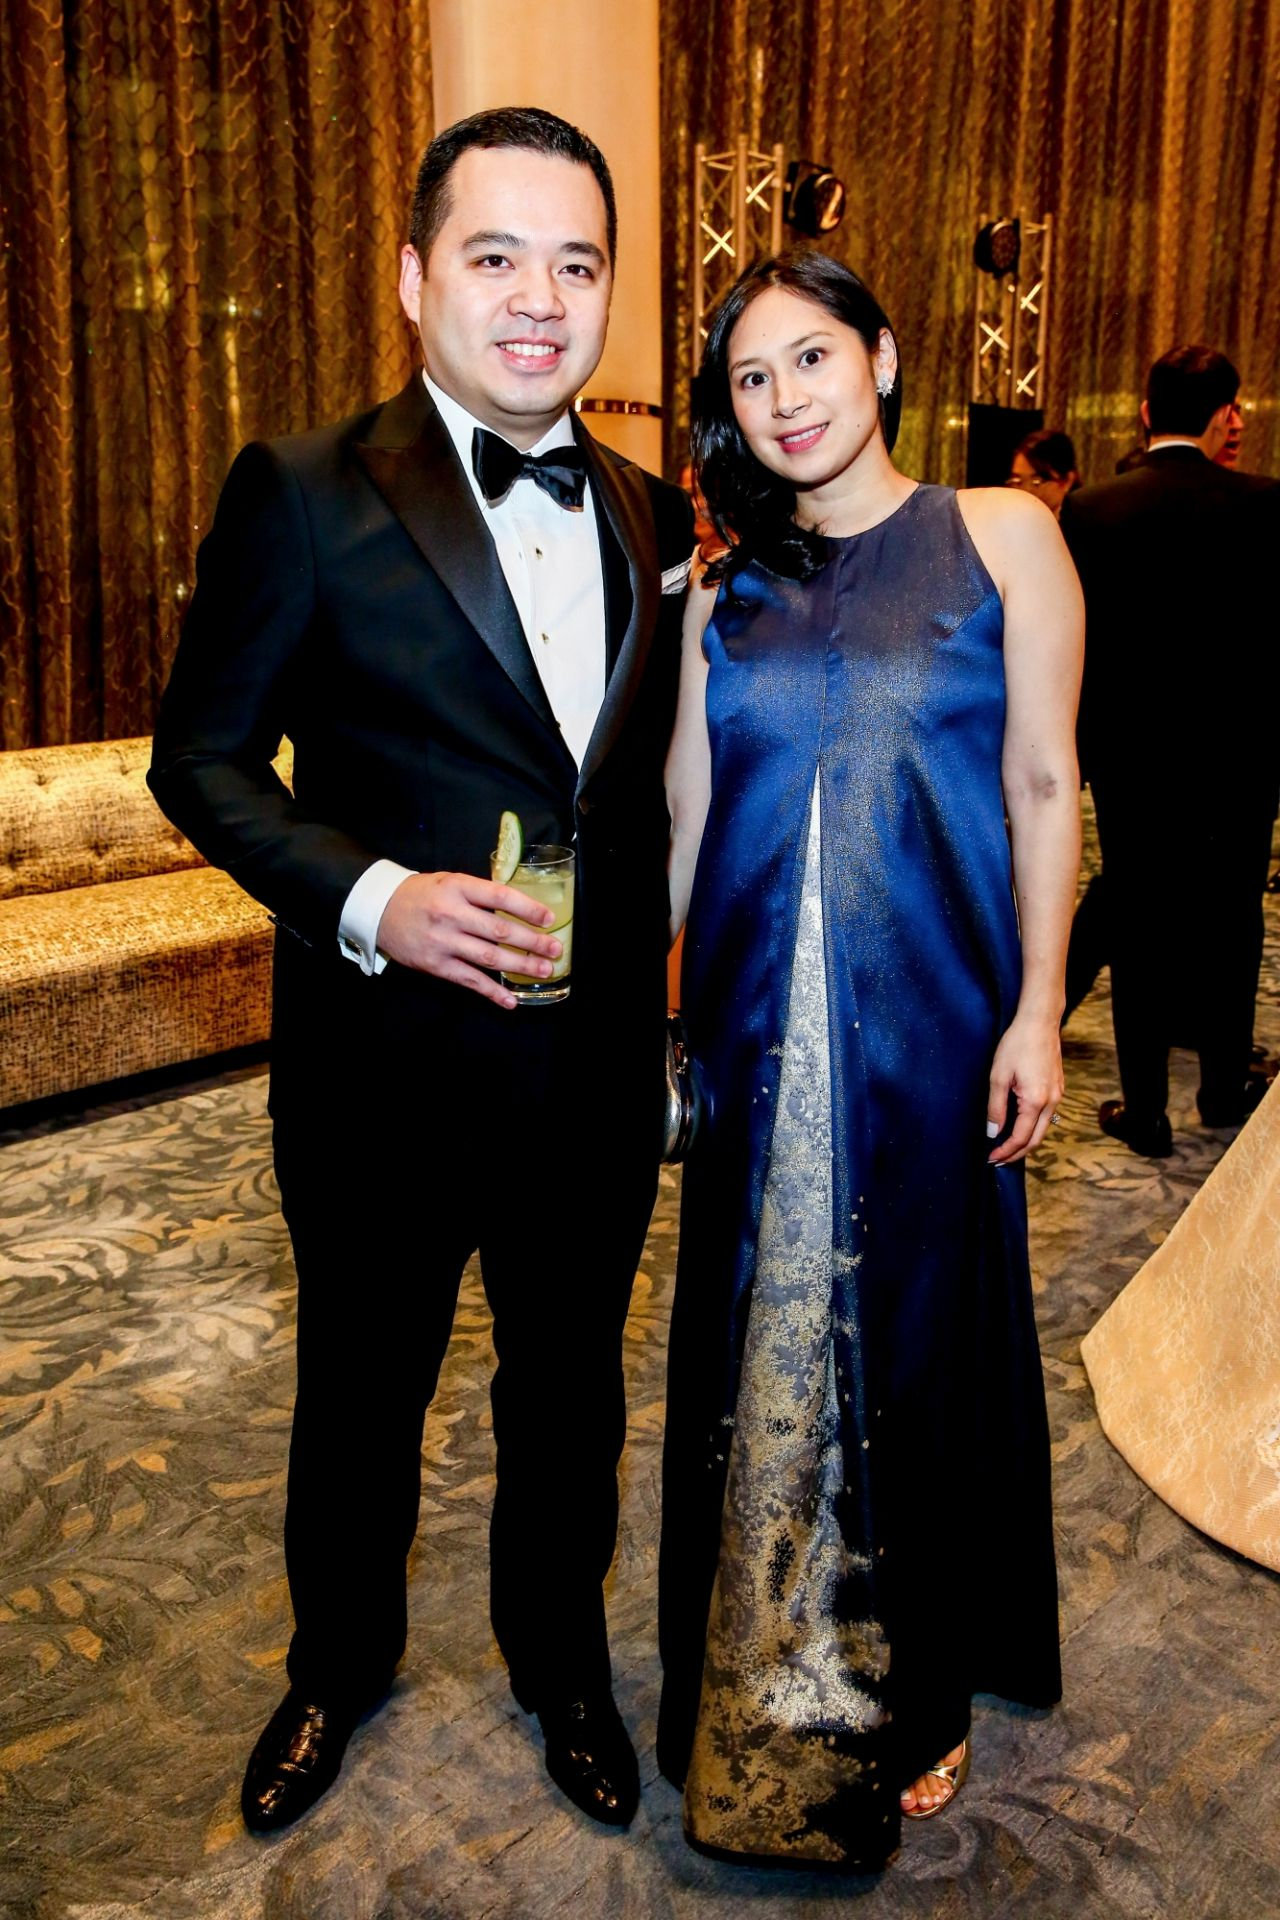 Paolo and Cristina Martel